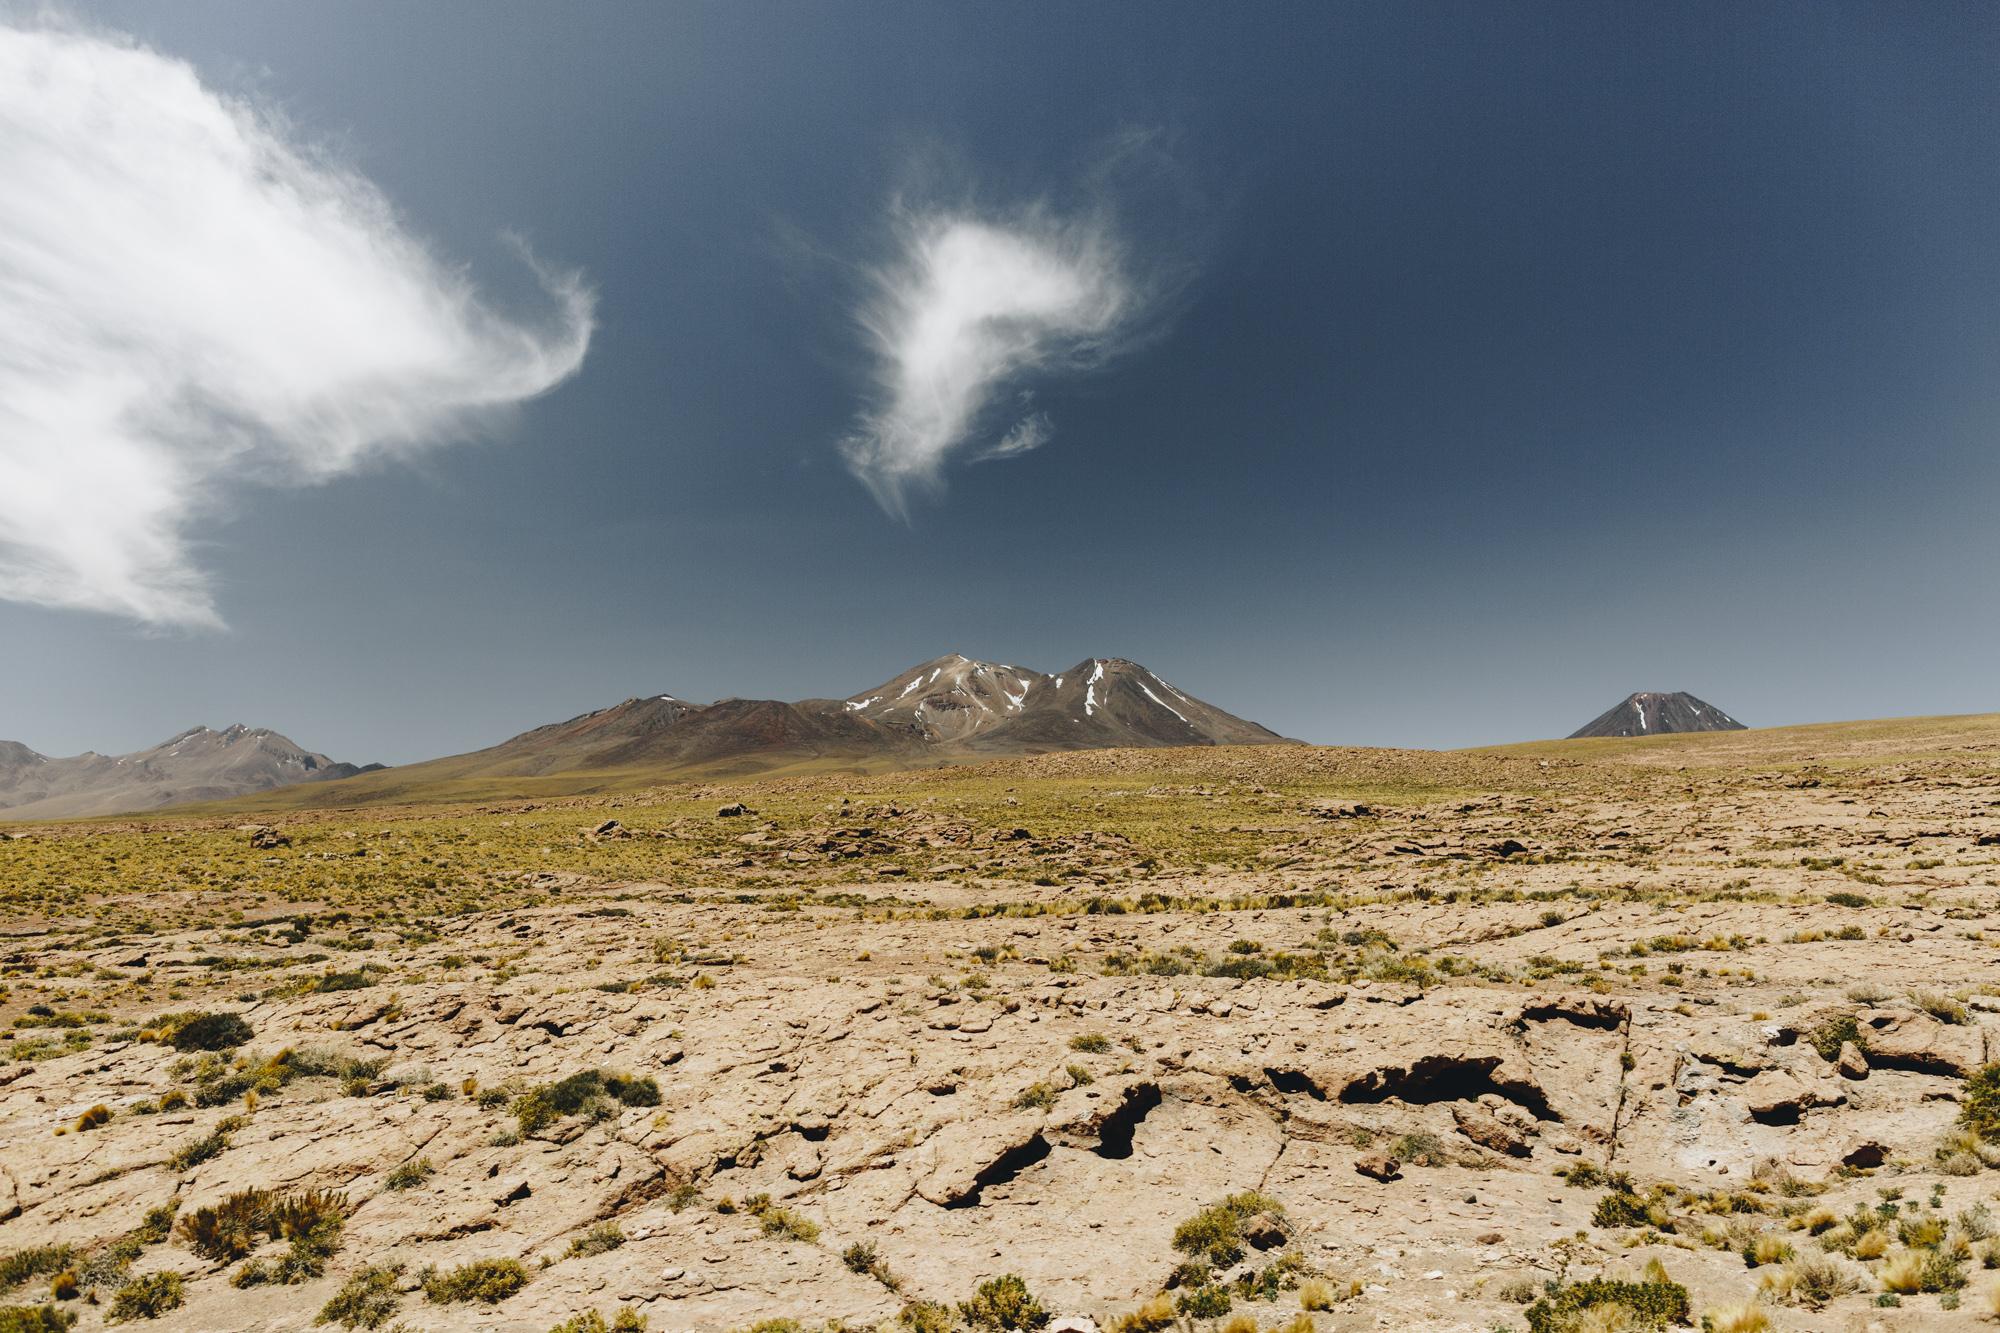 Mael Lambla photographer Chile San pedro atacama desert-255.jpg